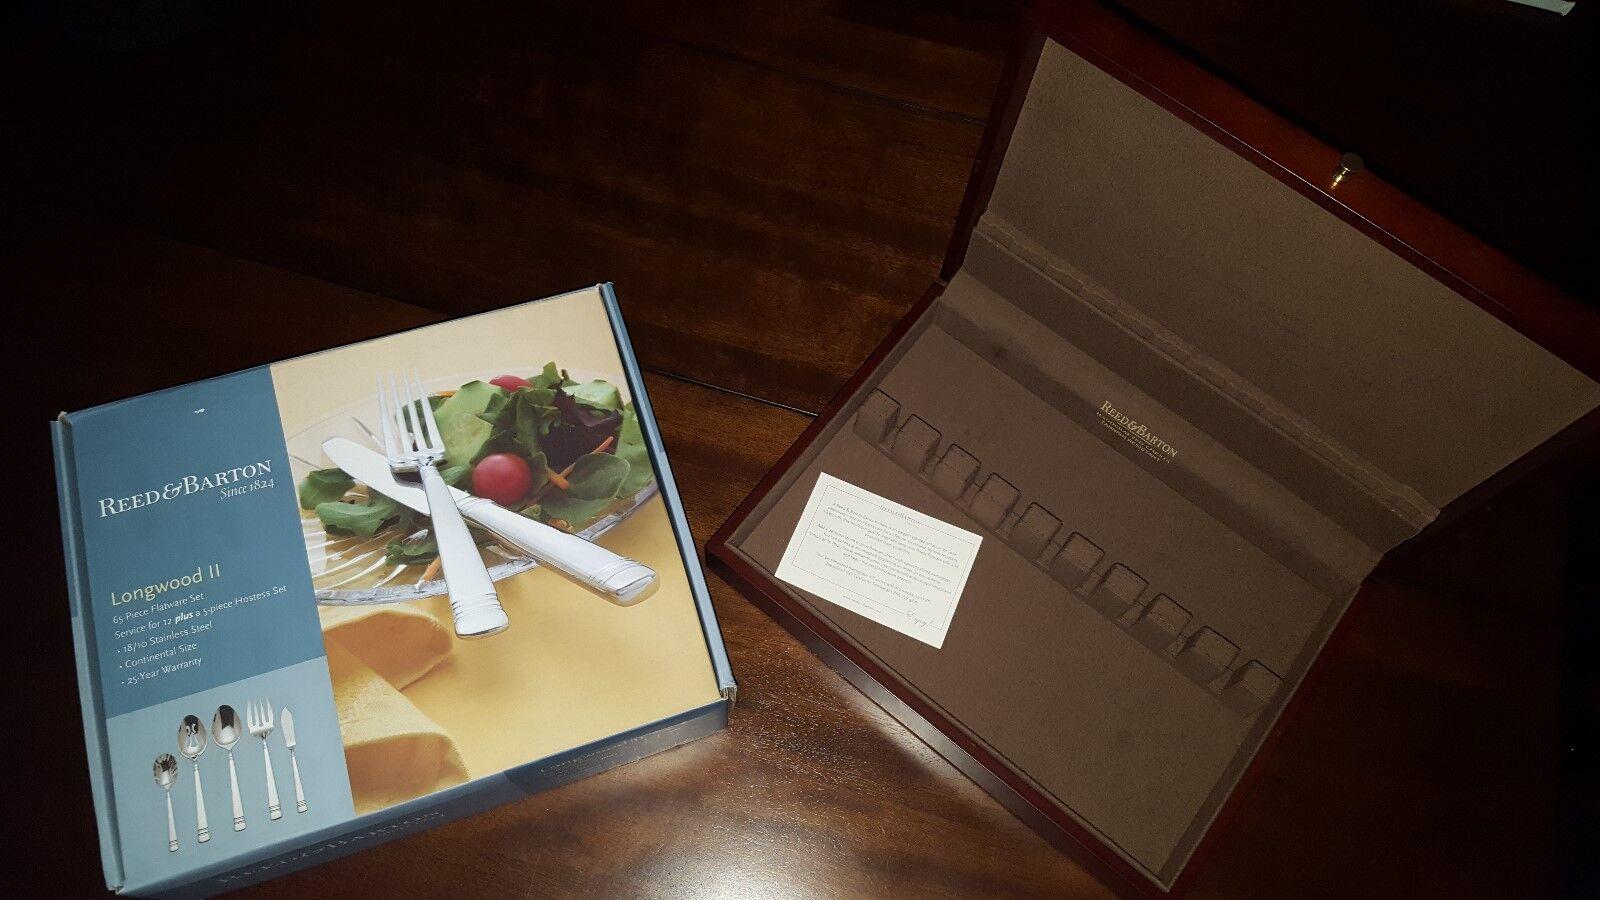 Reed & Barton Barton Barton Longwood II 65-Piece Stainless Flatware Set (With Storage Box) 74afd7